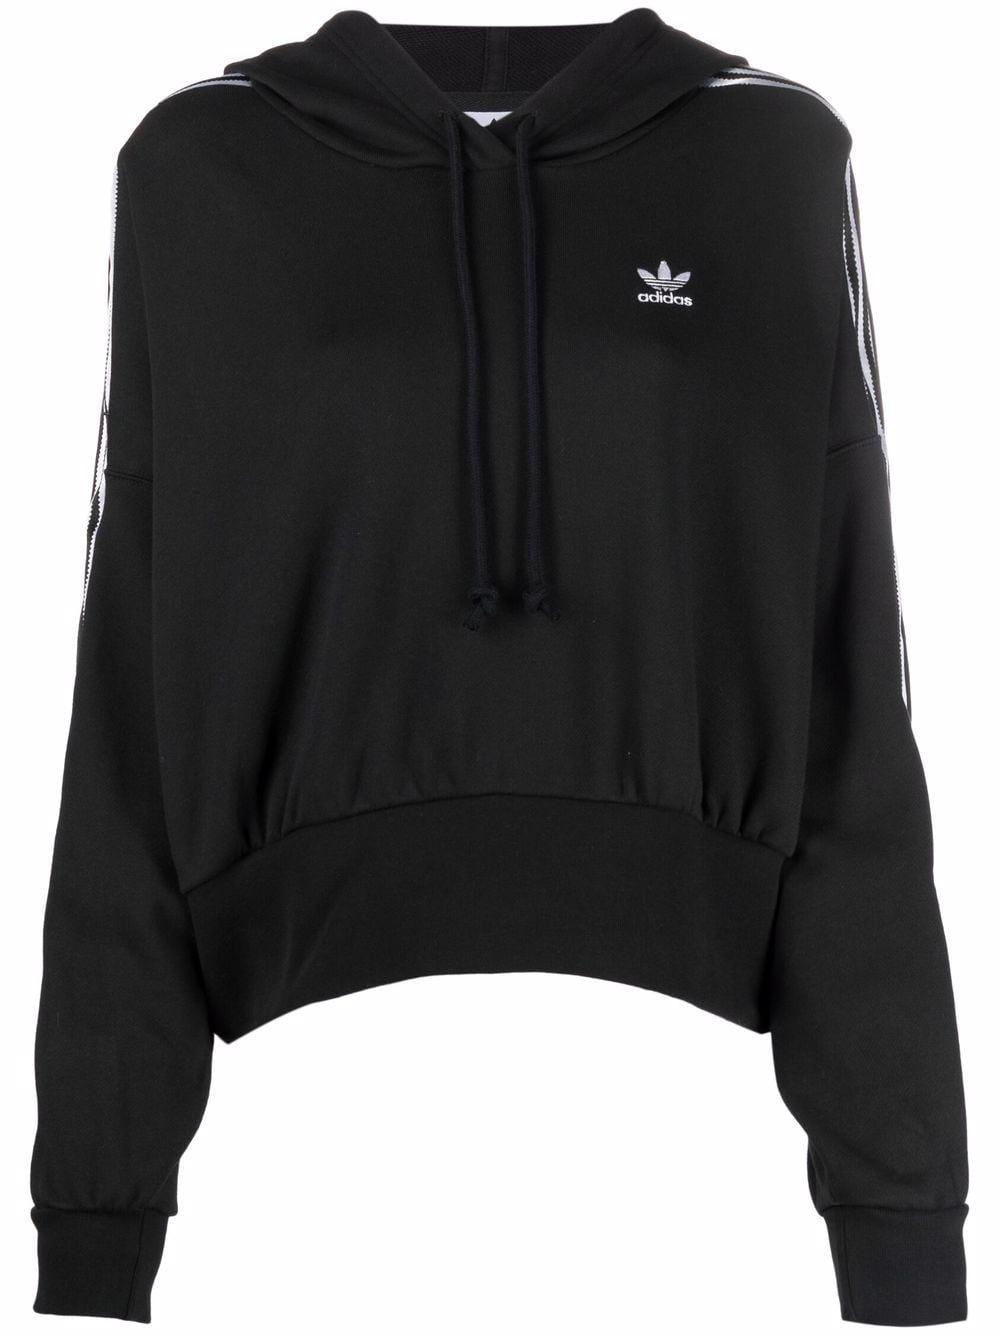 Adidas maglie nero